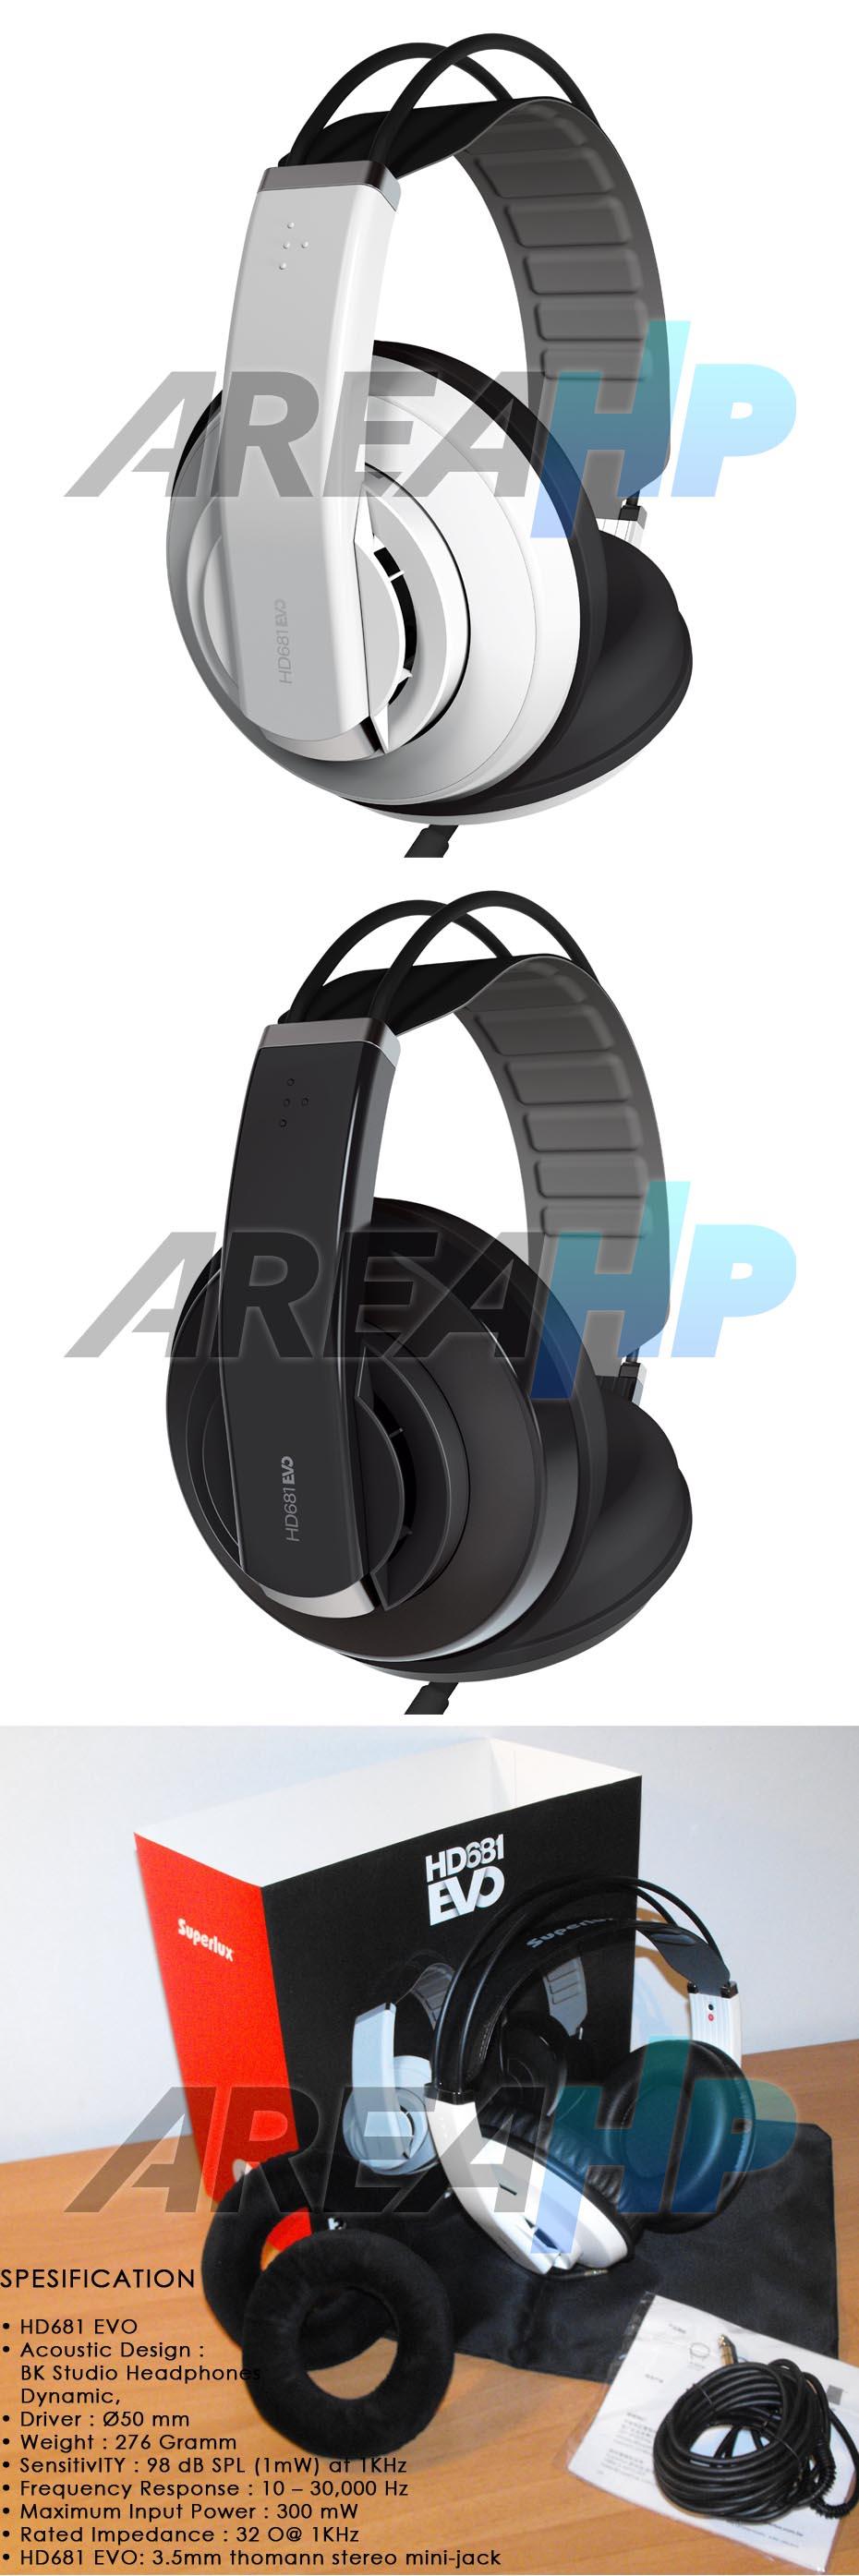 Headphone Superlux HD681 EVO Overview